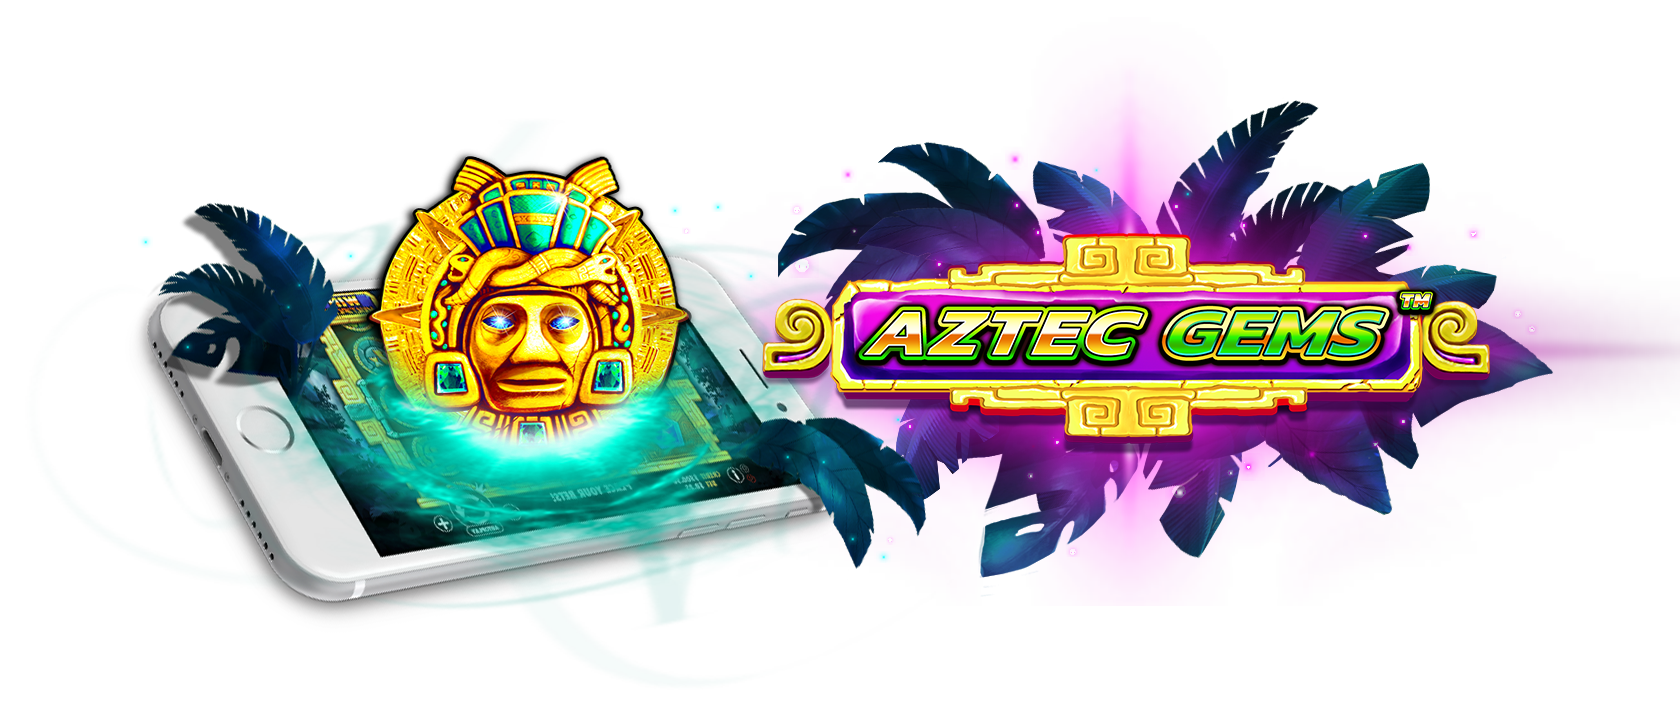 aztec gems slots game logo